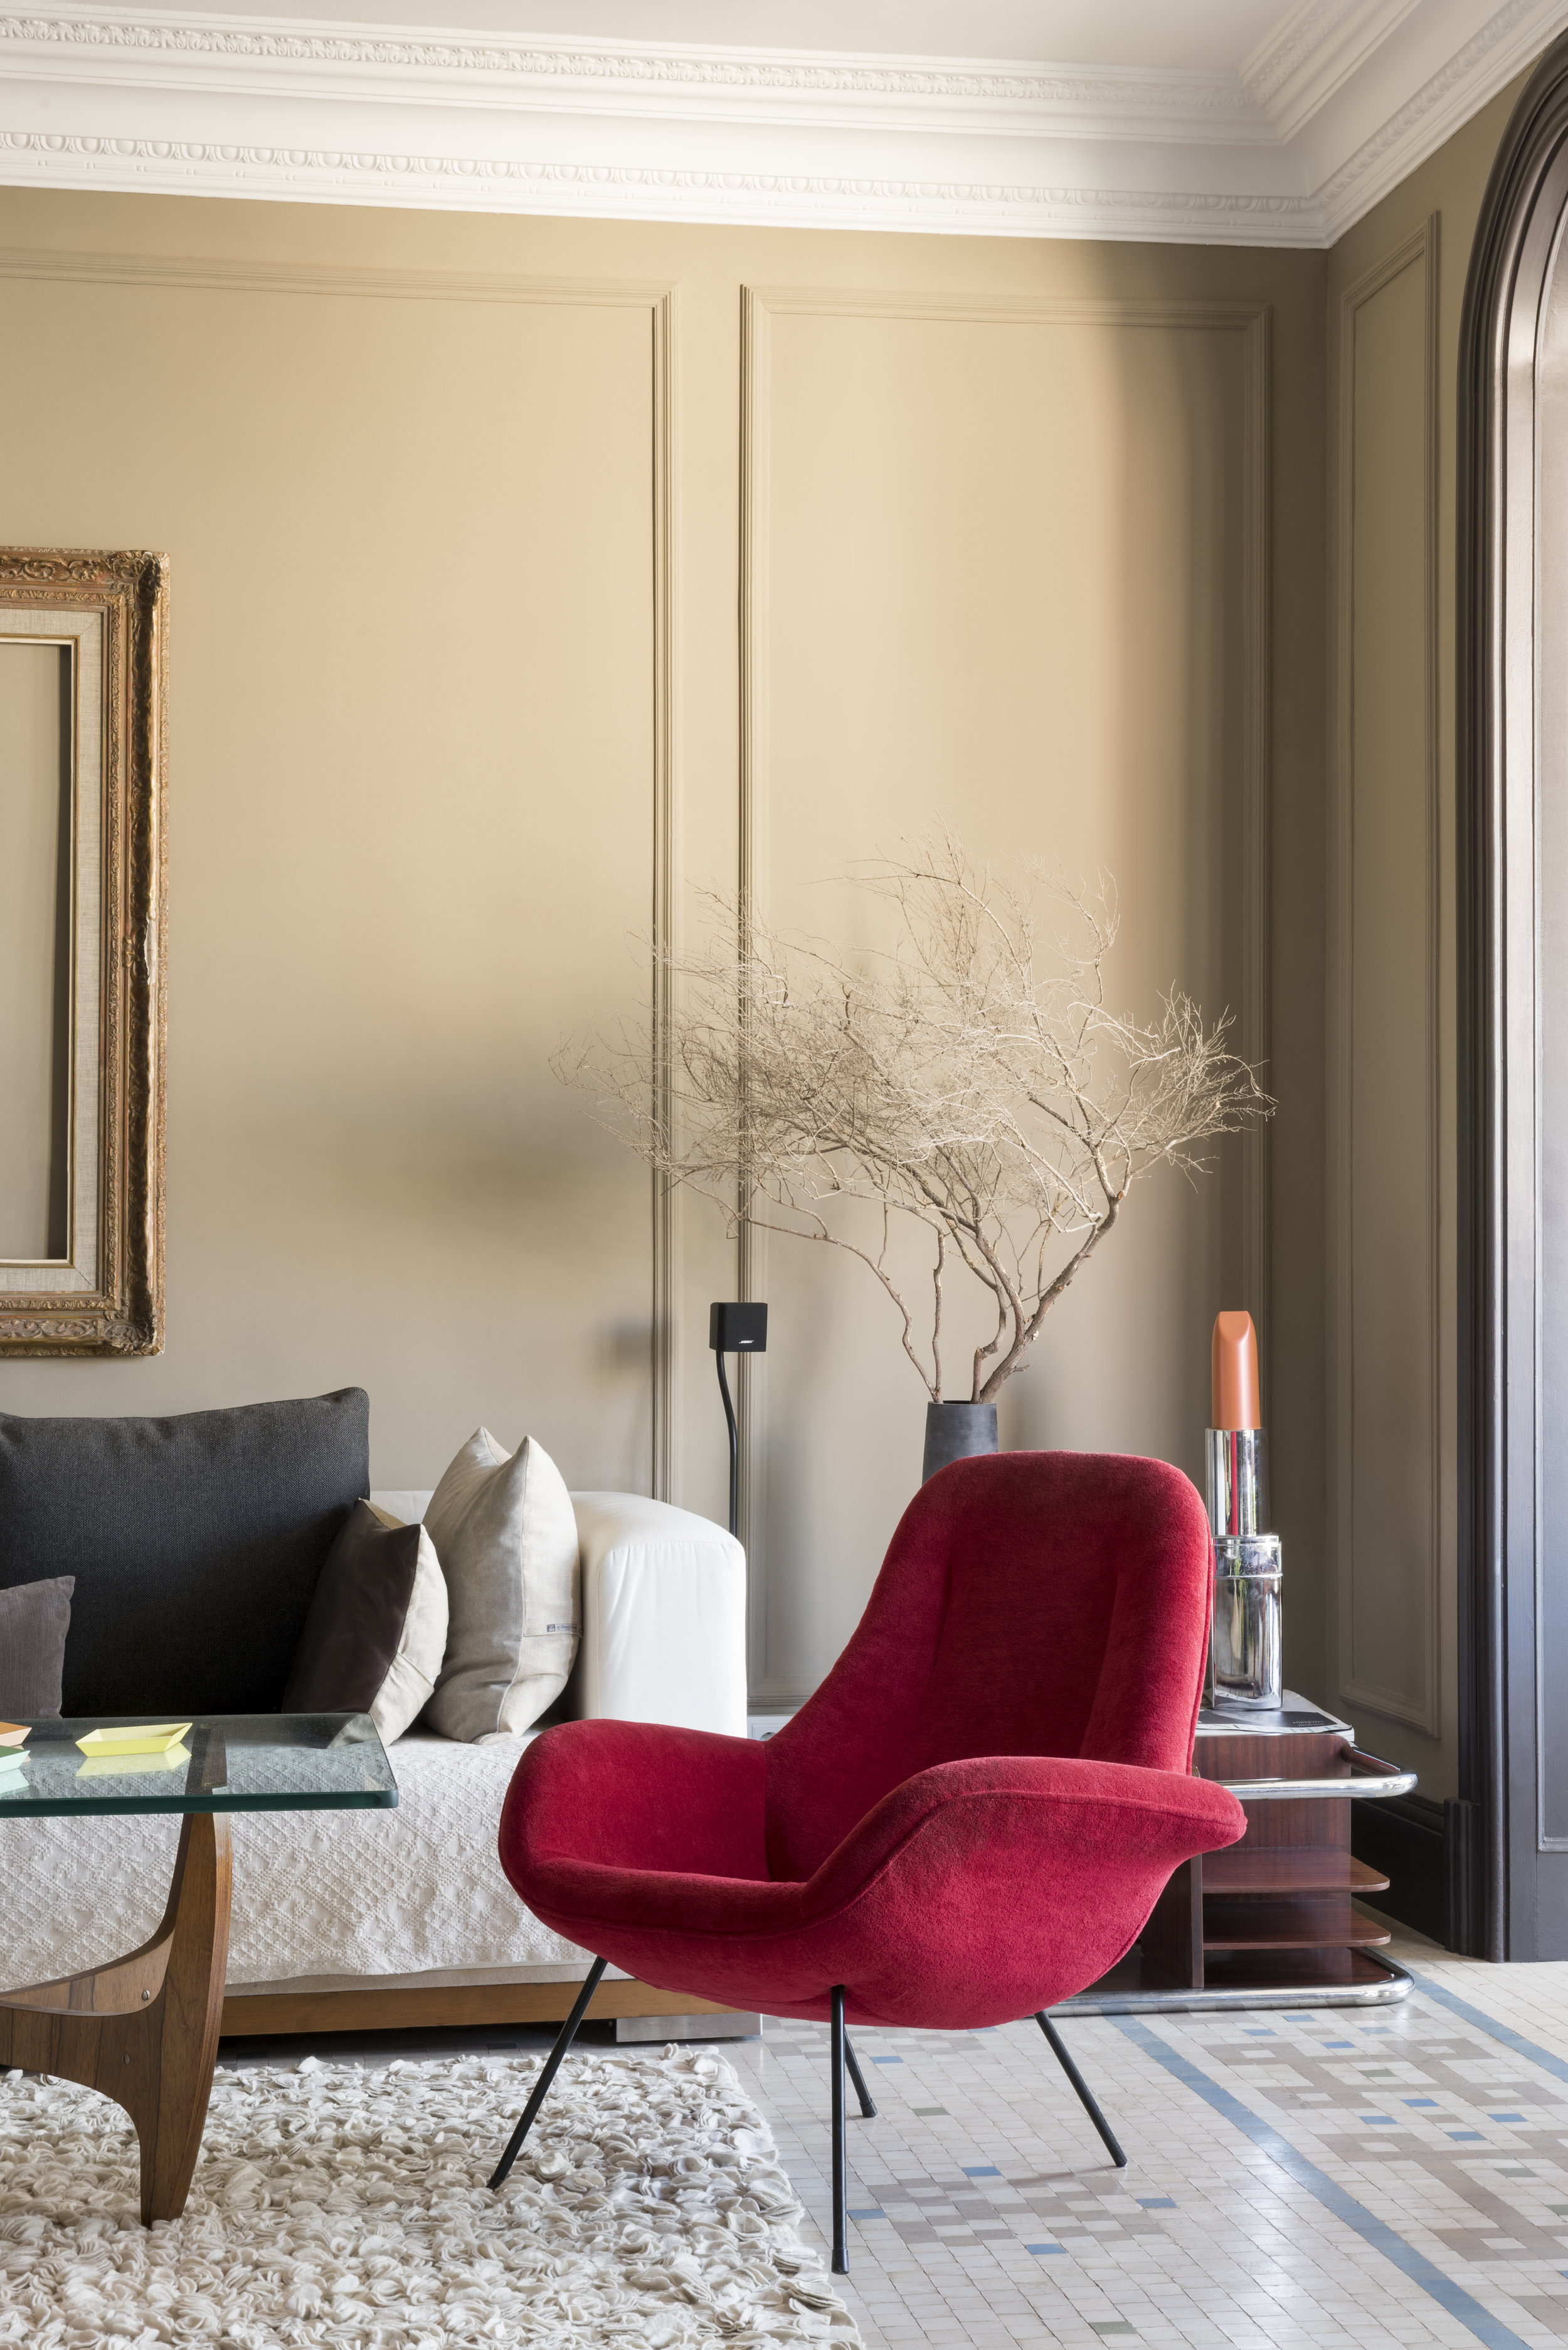 GeorgKayser_architecture_interiordesign_residencial_grandegracia_11.jpg